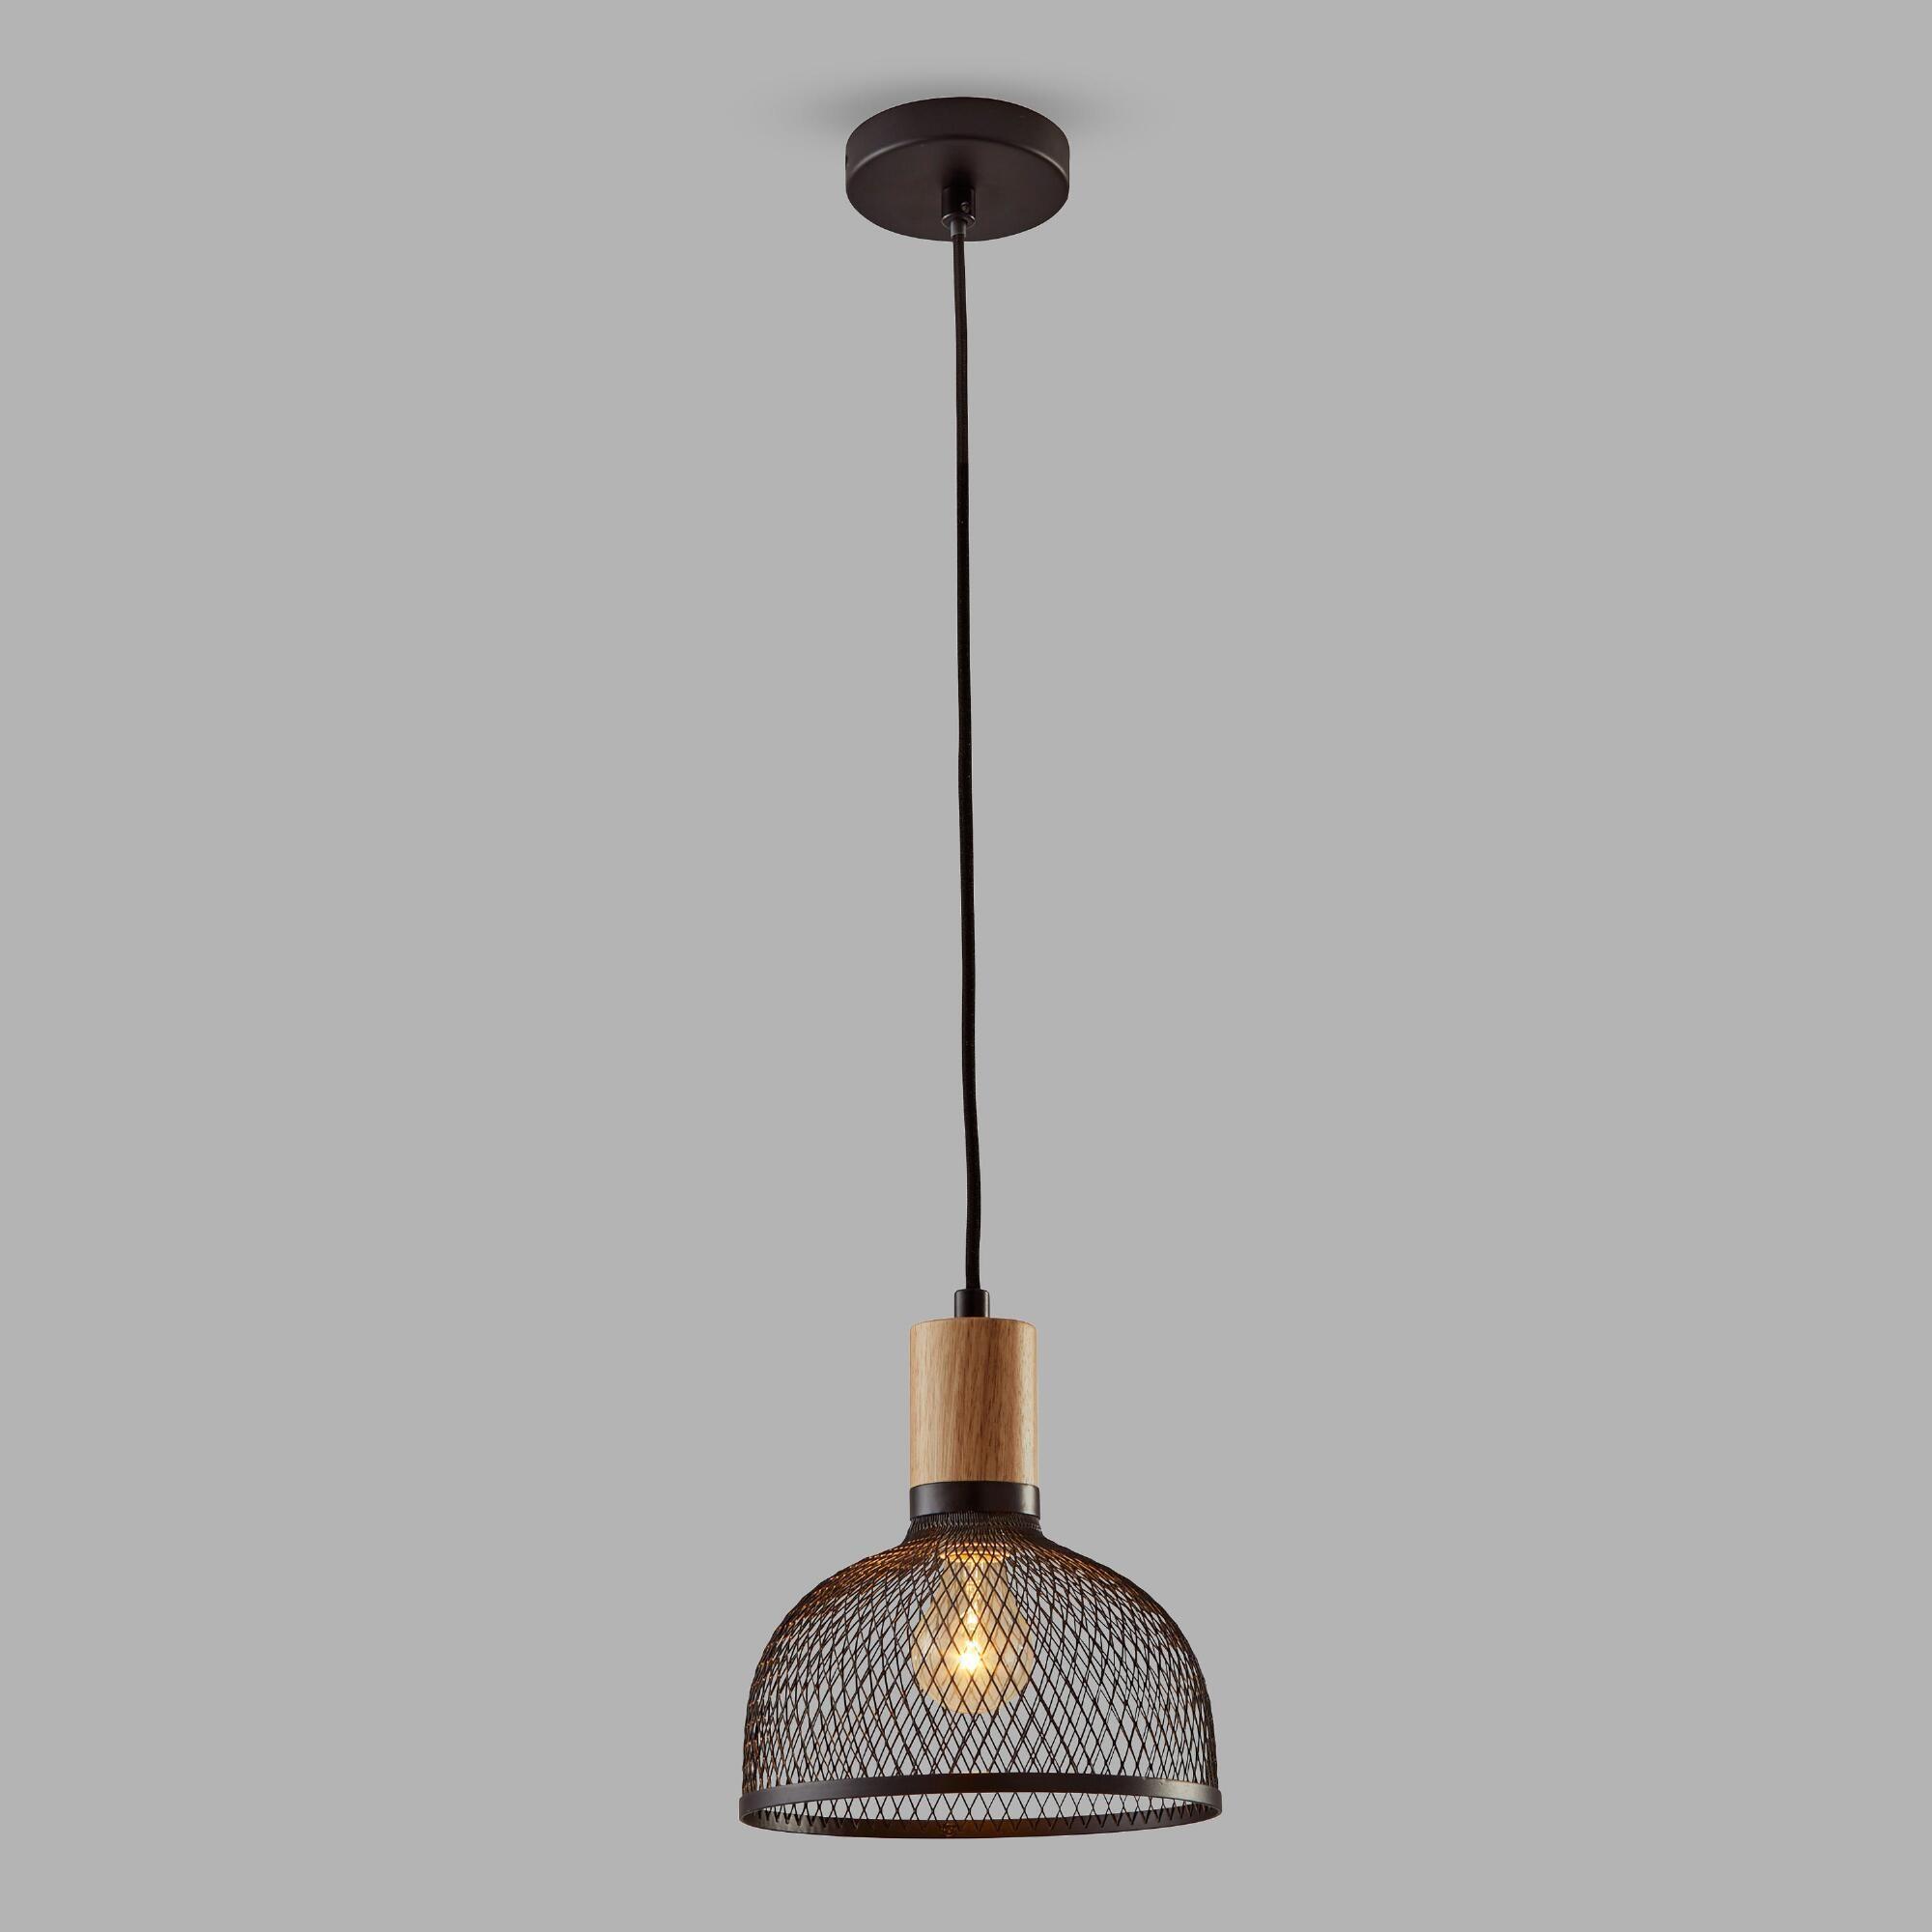 Small Black Mesh And Wood Clint Pendant Lamp: Black/natural Regarding Devereaux 1 Light Single Globe Pendants (View 10 of 30)